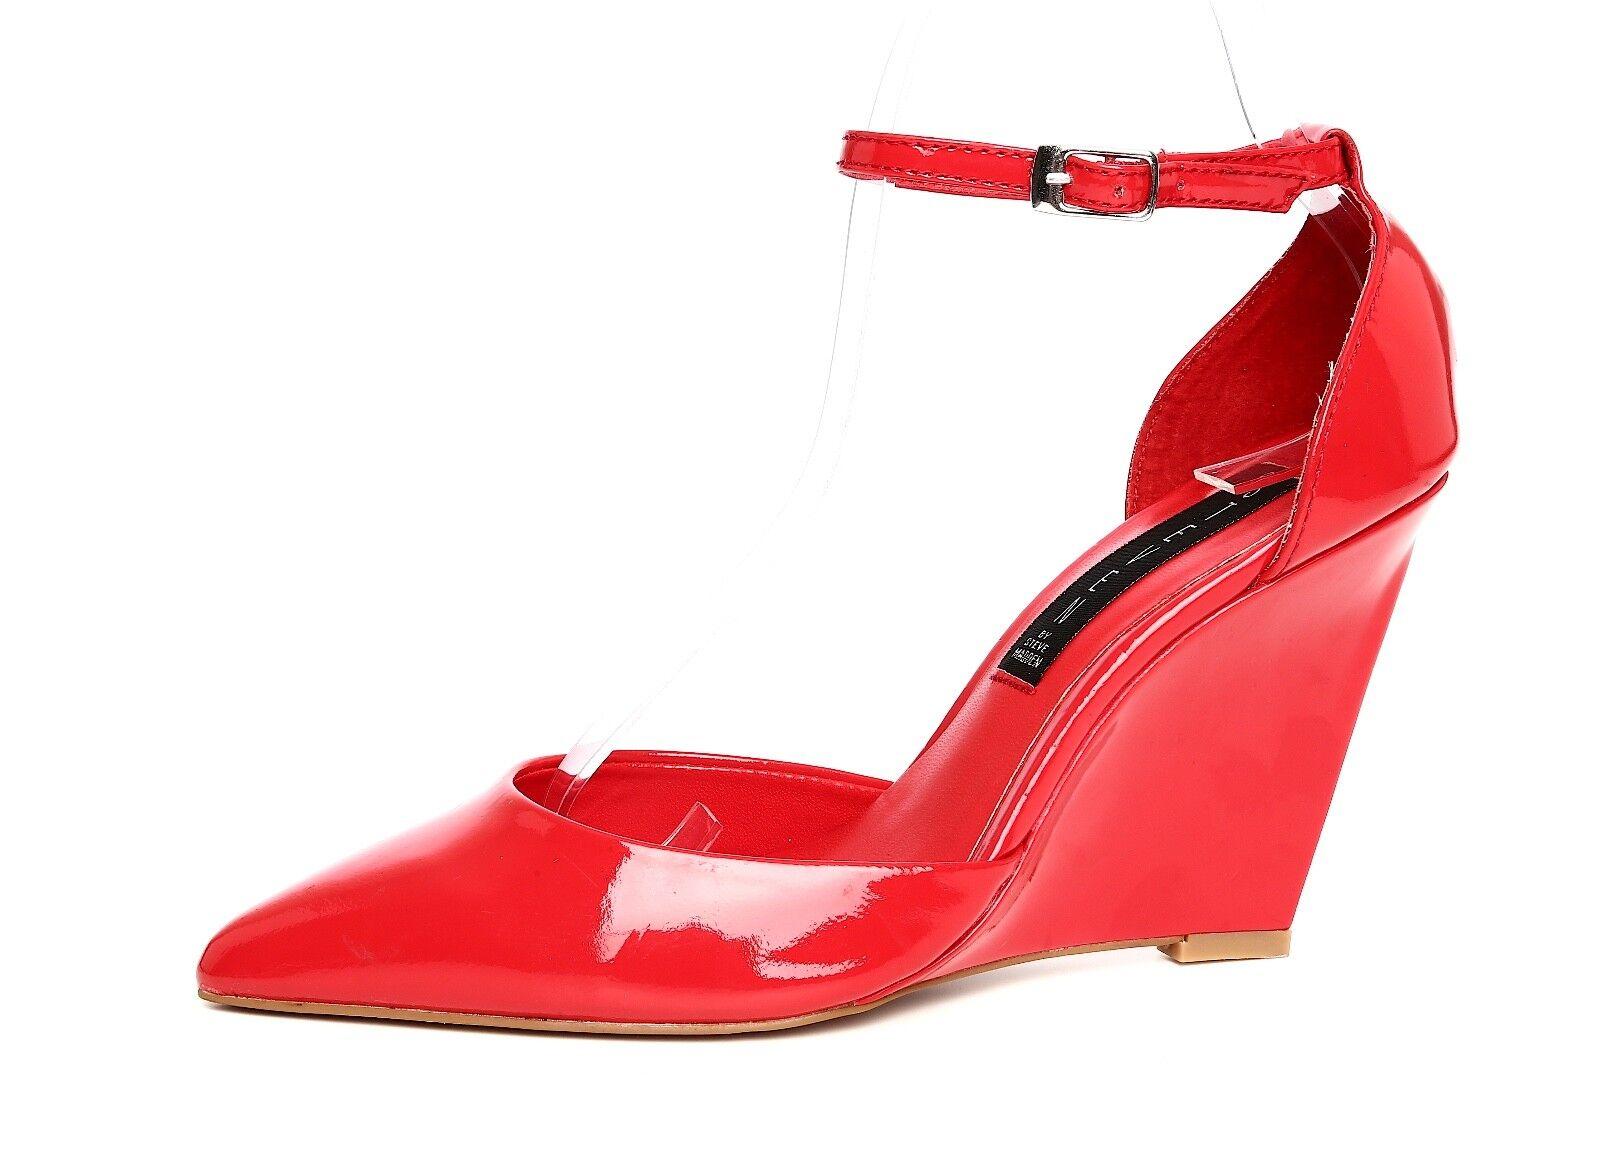 Steven By Steve Madden Chrli Women's Red Patent Leather Wedge Pump Sz 6M 4890